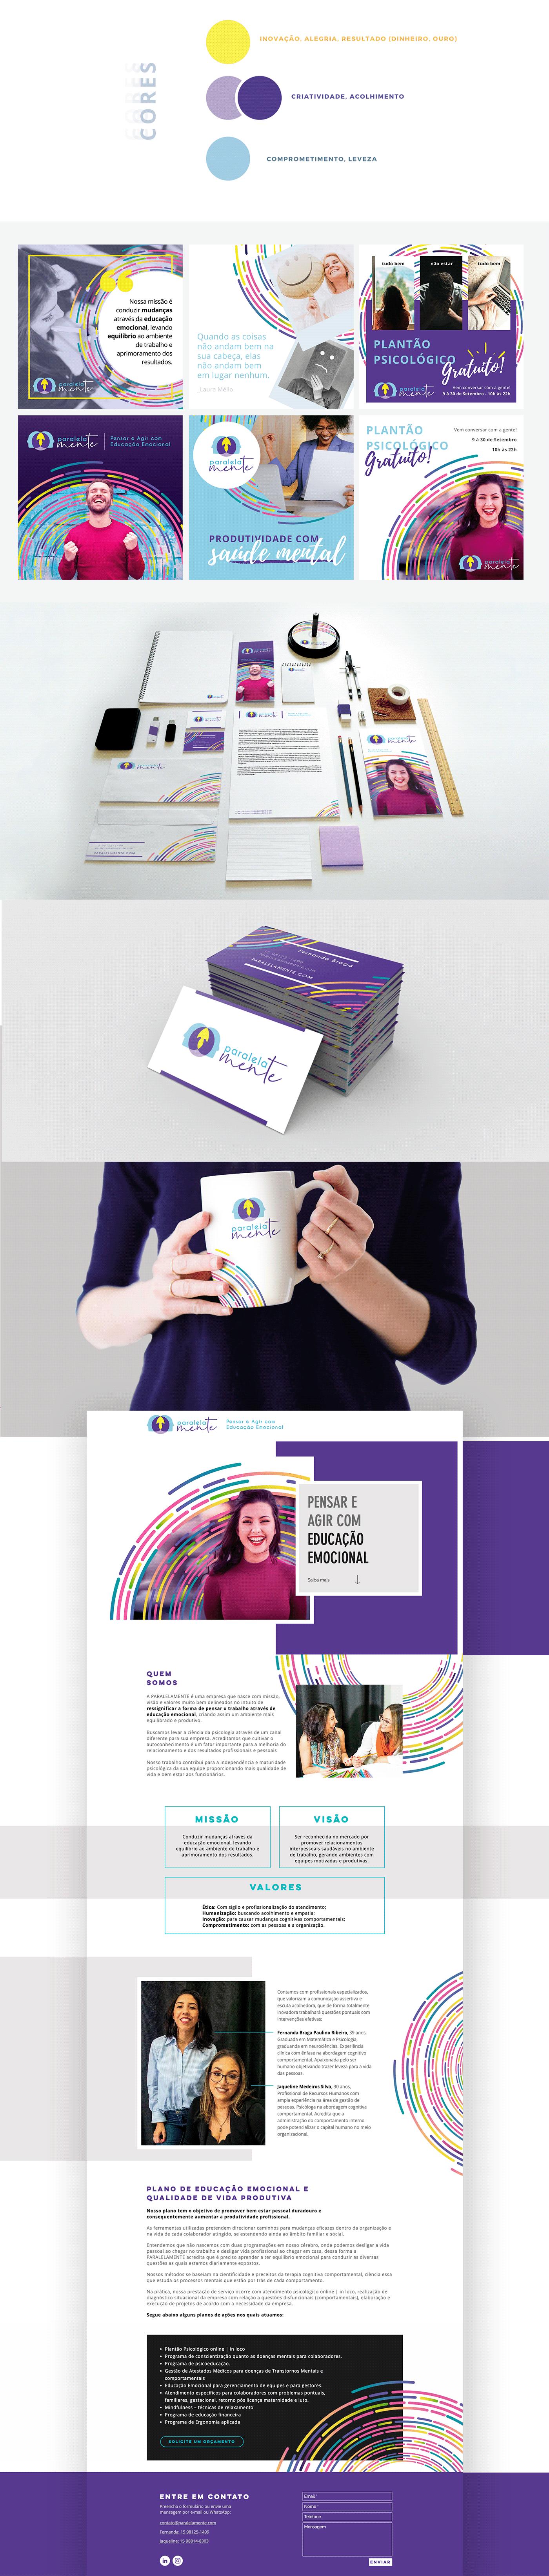 brand branding  design identidade visual logo Logotipo marca